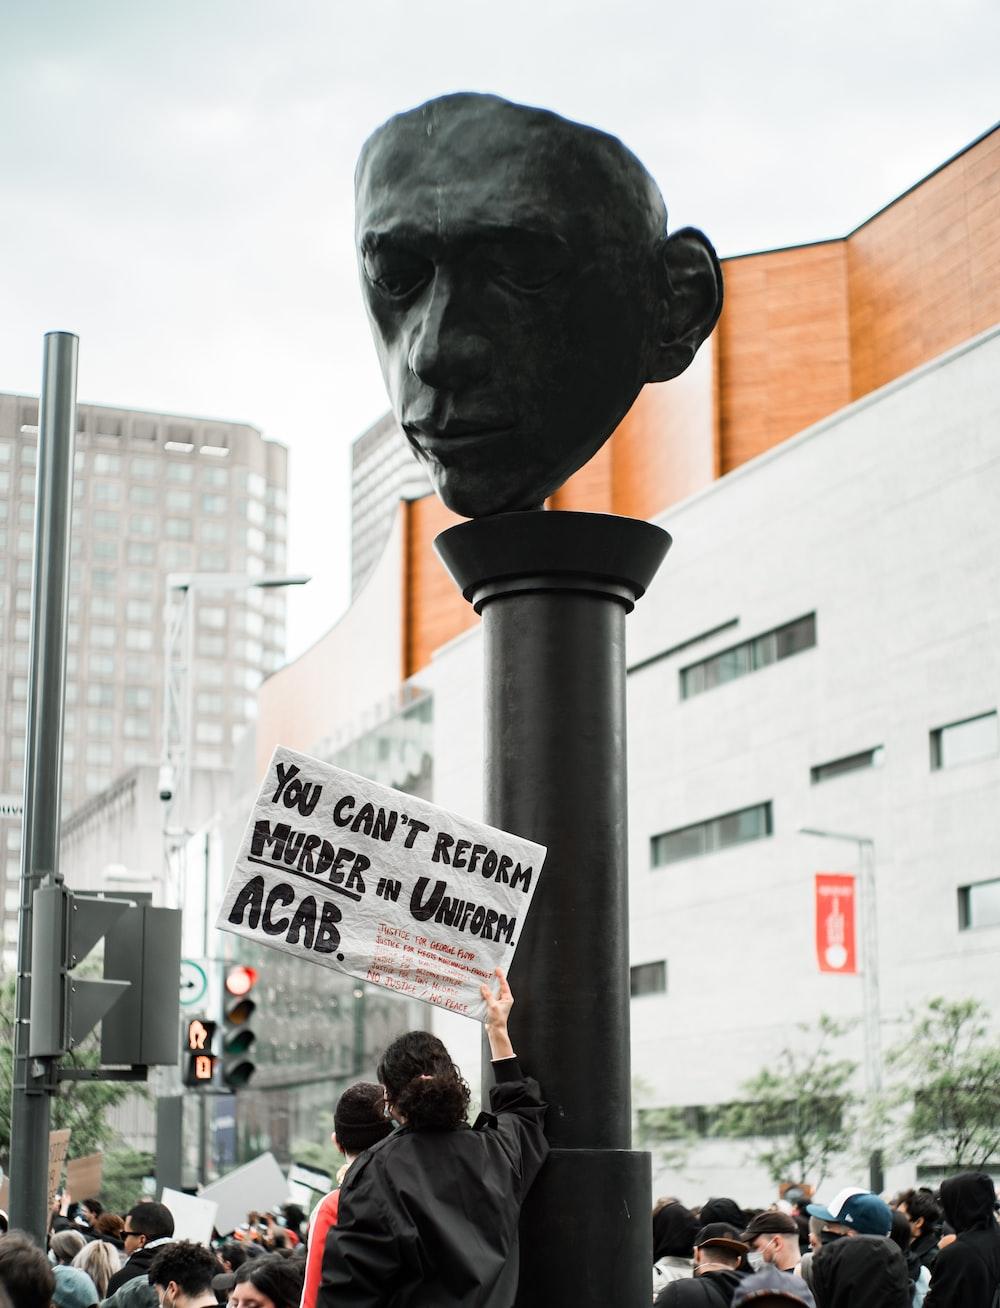 man in black jacket standing near black statue